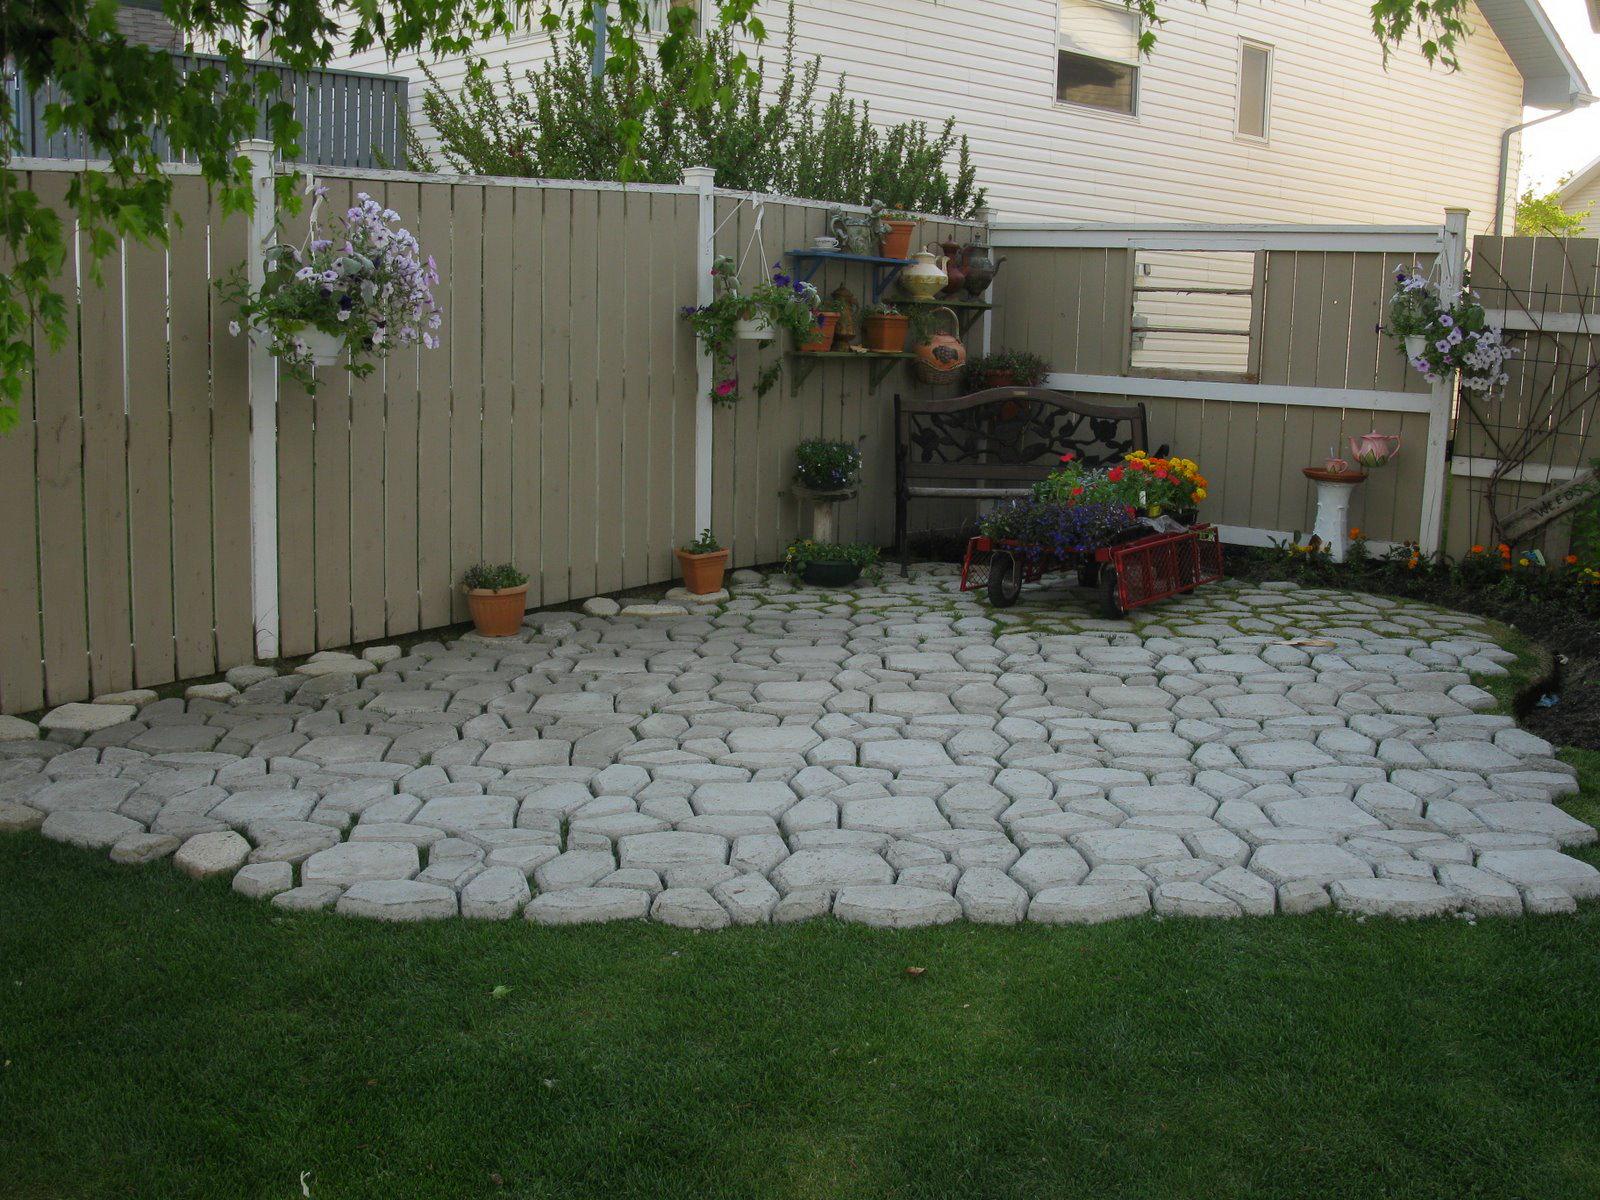 Сделать во дворе дома своими руками двор фото фото 430